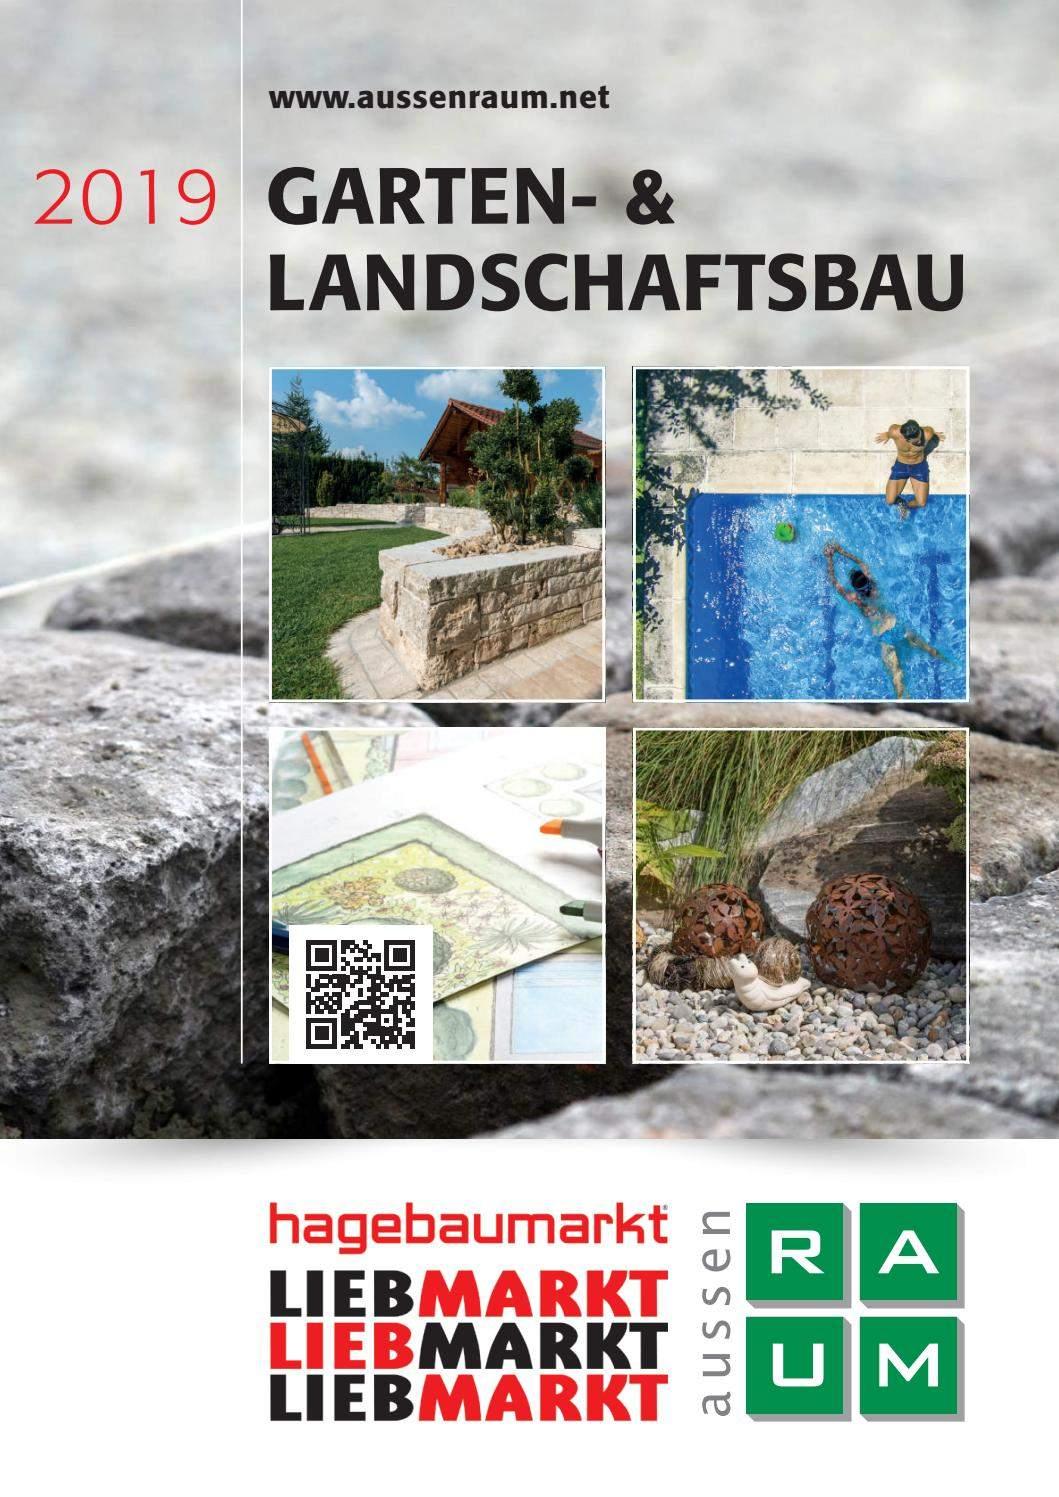 Brunnenpumpe Garten Inspirierend Aussenraum Katalog 2018 by Lieb issuu